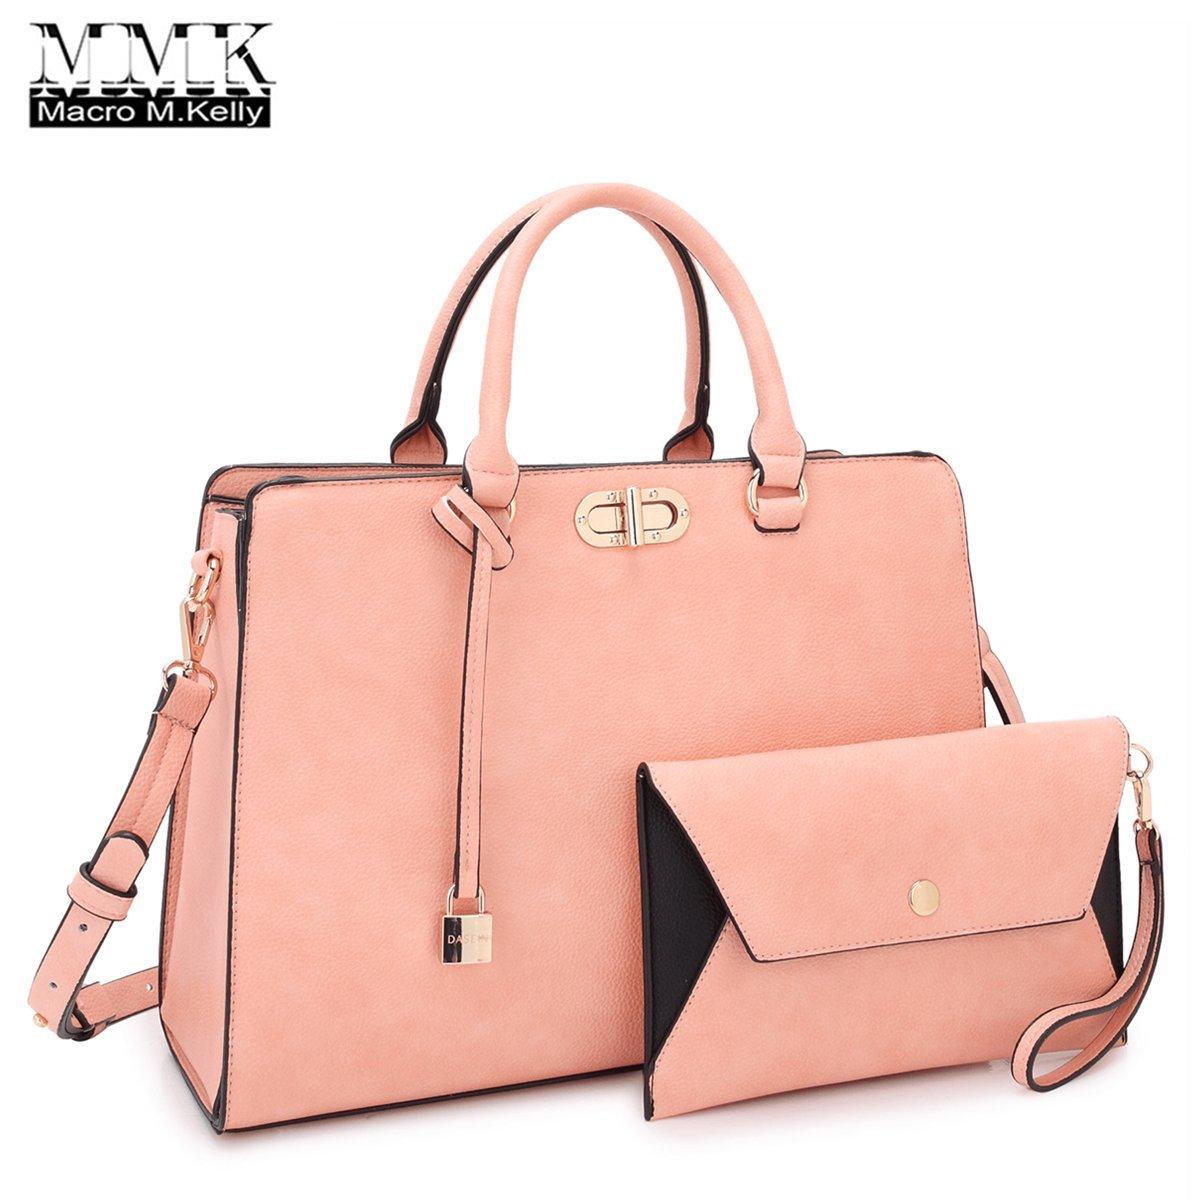 MMK collection Fashion Women Purses and Handbags Ladies Designer Satchel Handbag Tote Bag Shoulder Bags with coin purse (XL-23-7581-pink)